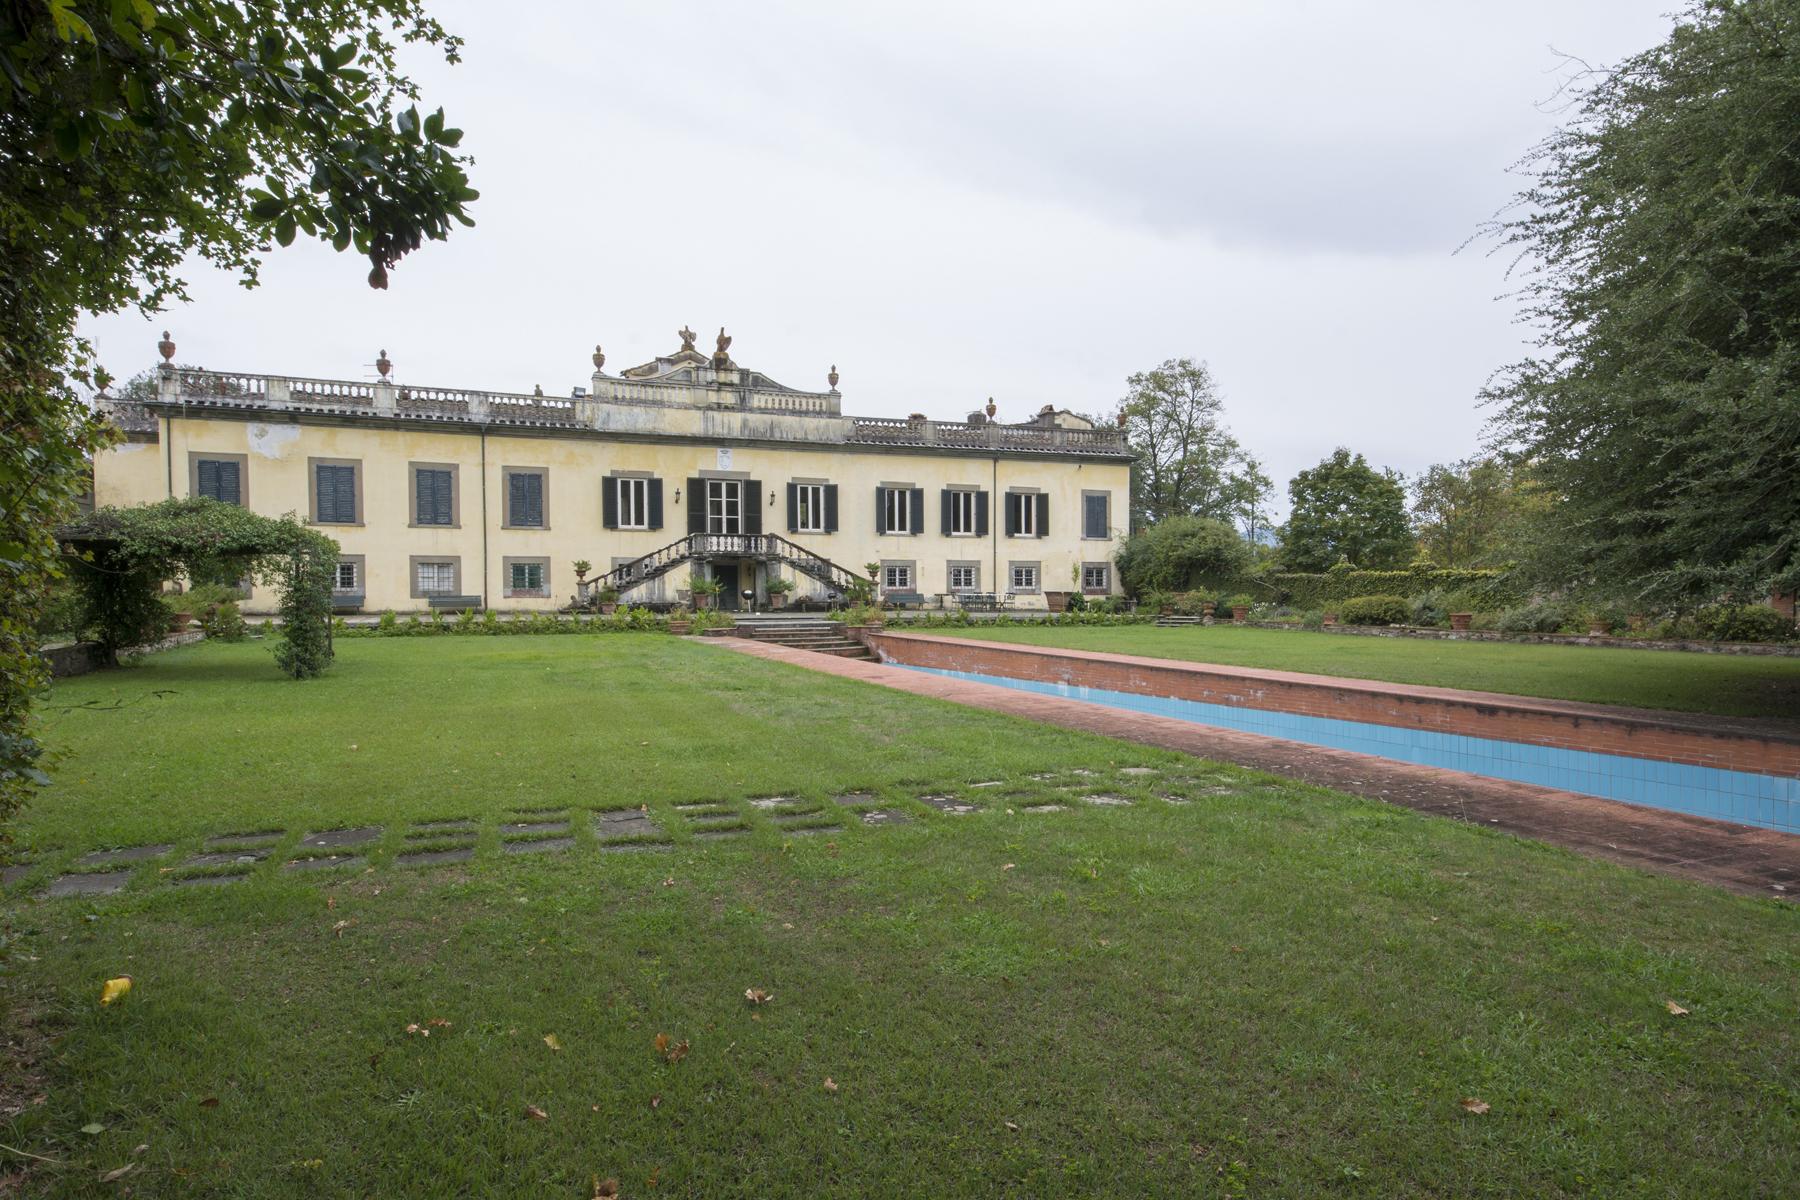 Villa in Vendita a Lucca: 5 locali, 2451 mq - Foto 2